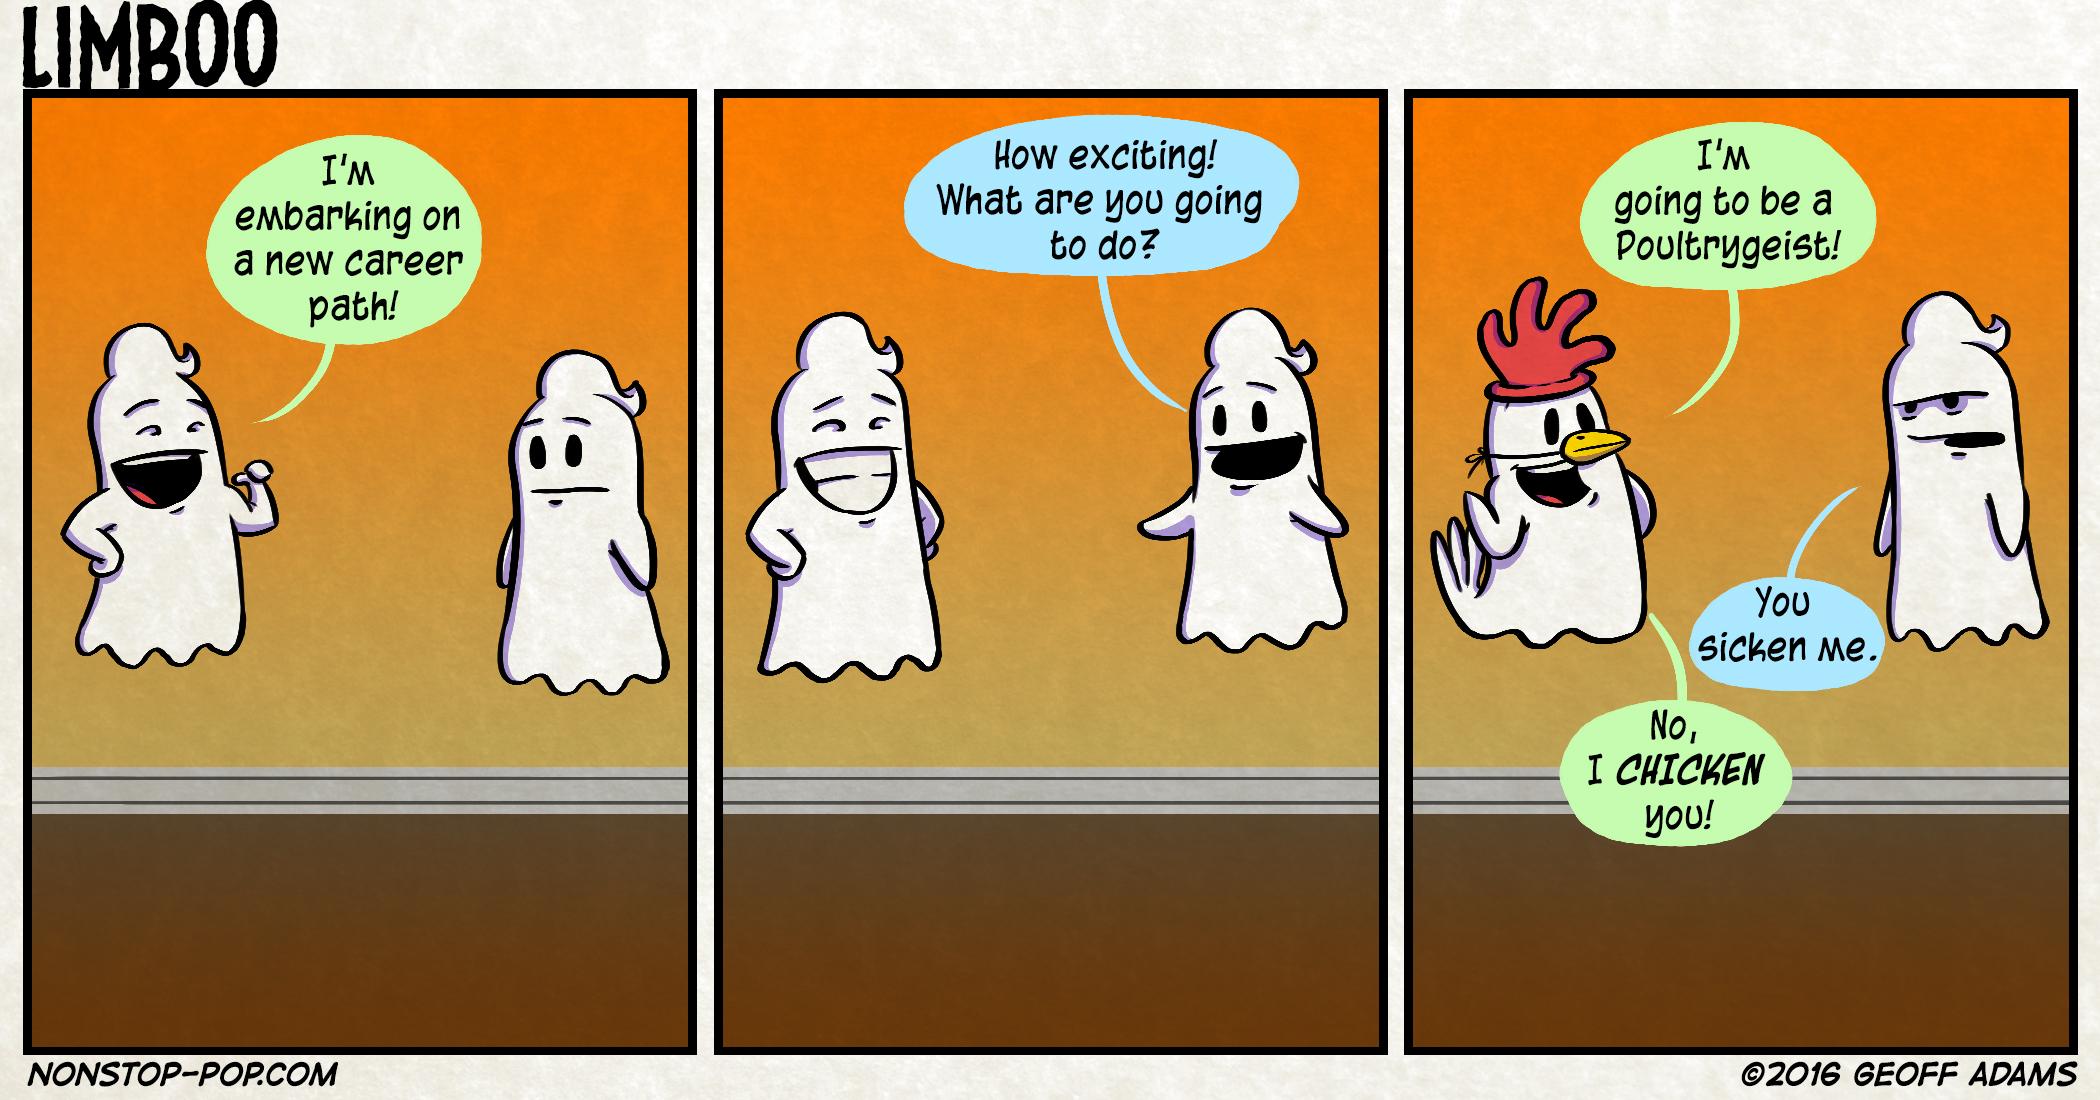 Chicken Boo.